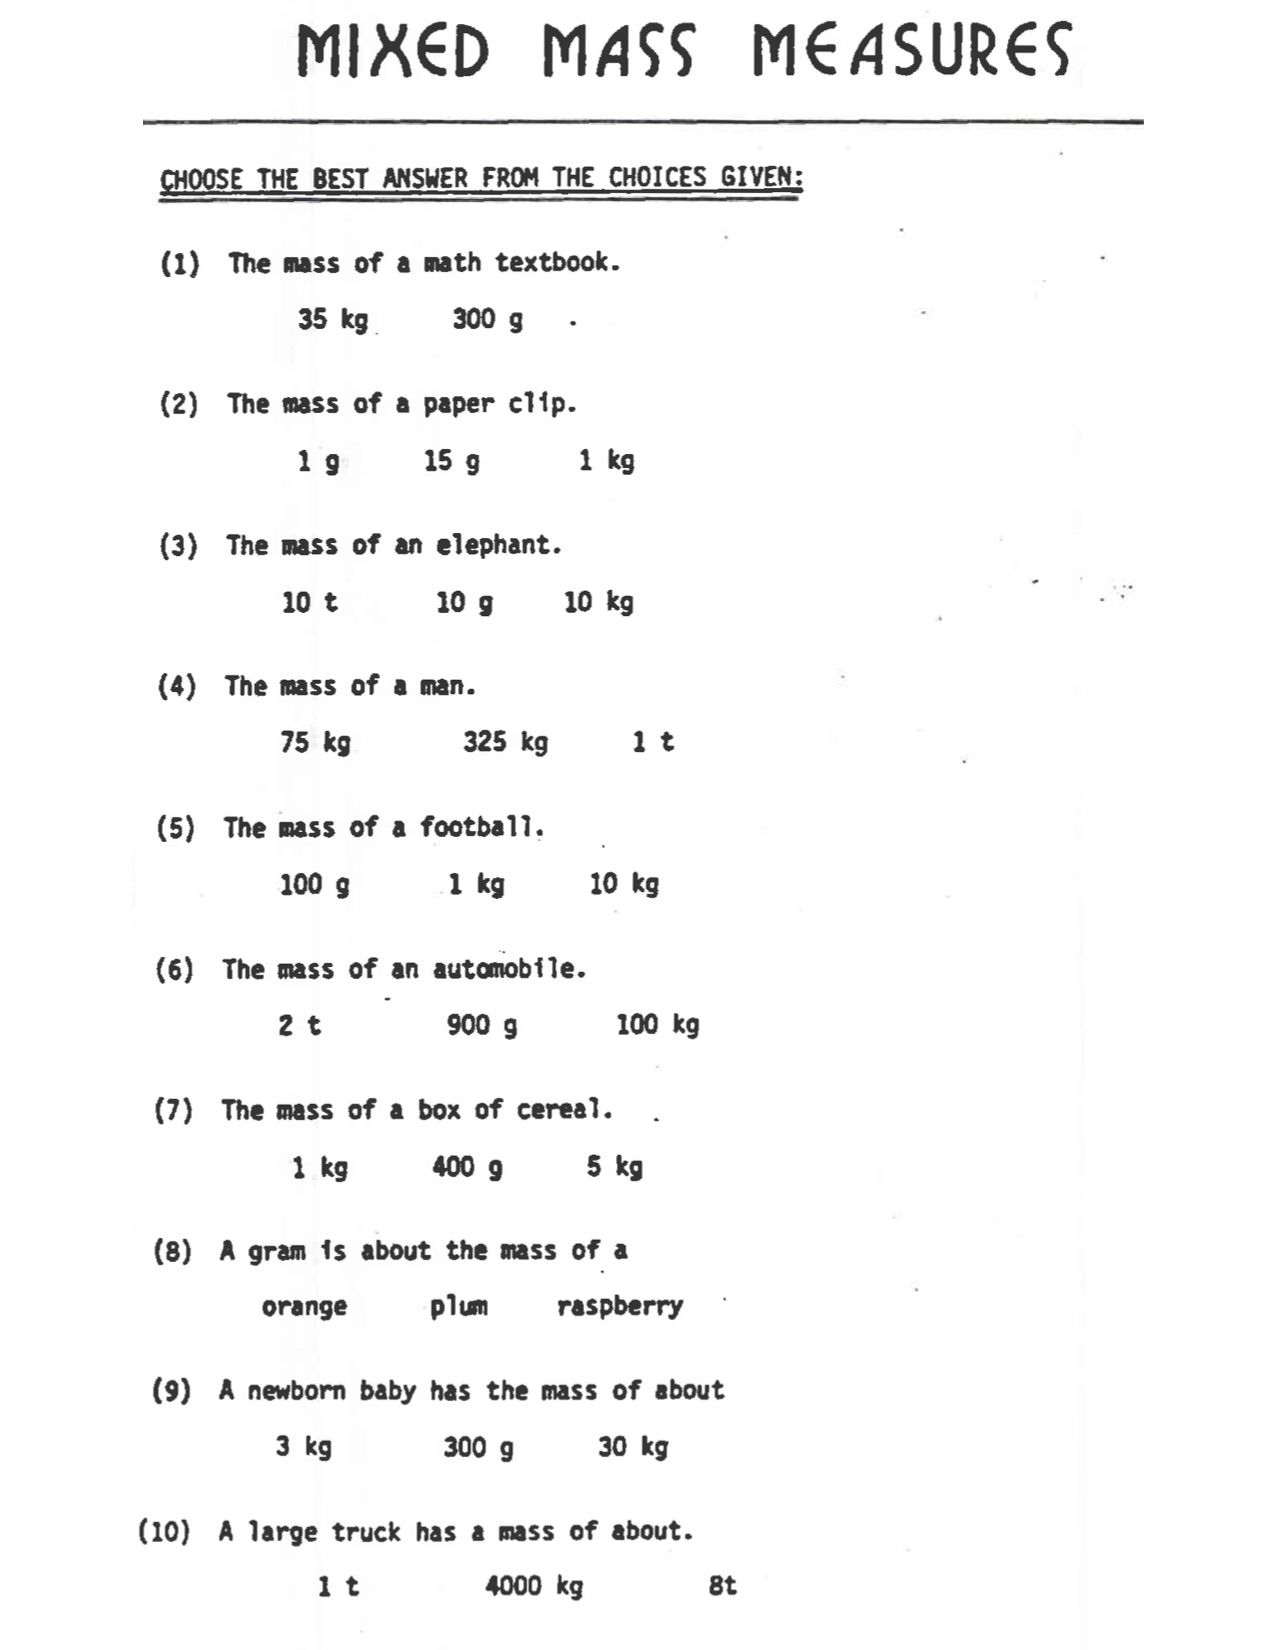 Math Gr4 Measurement Mass Estimate In